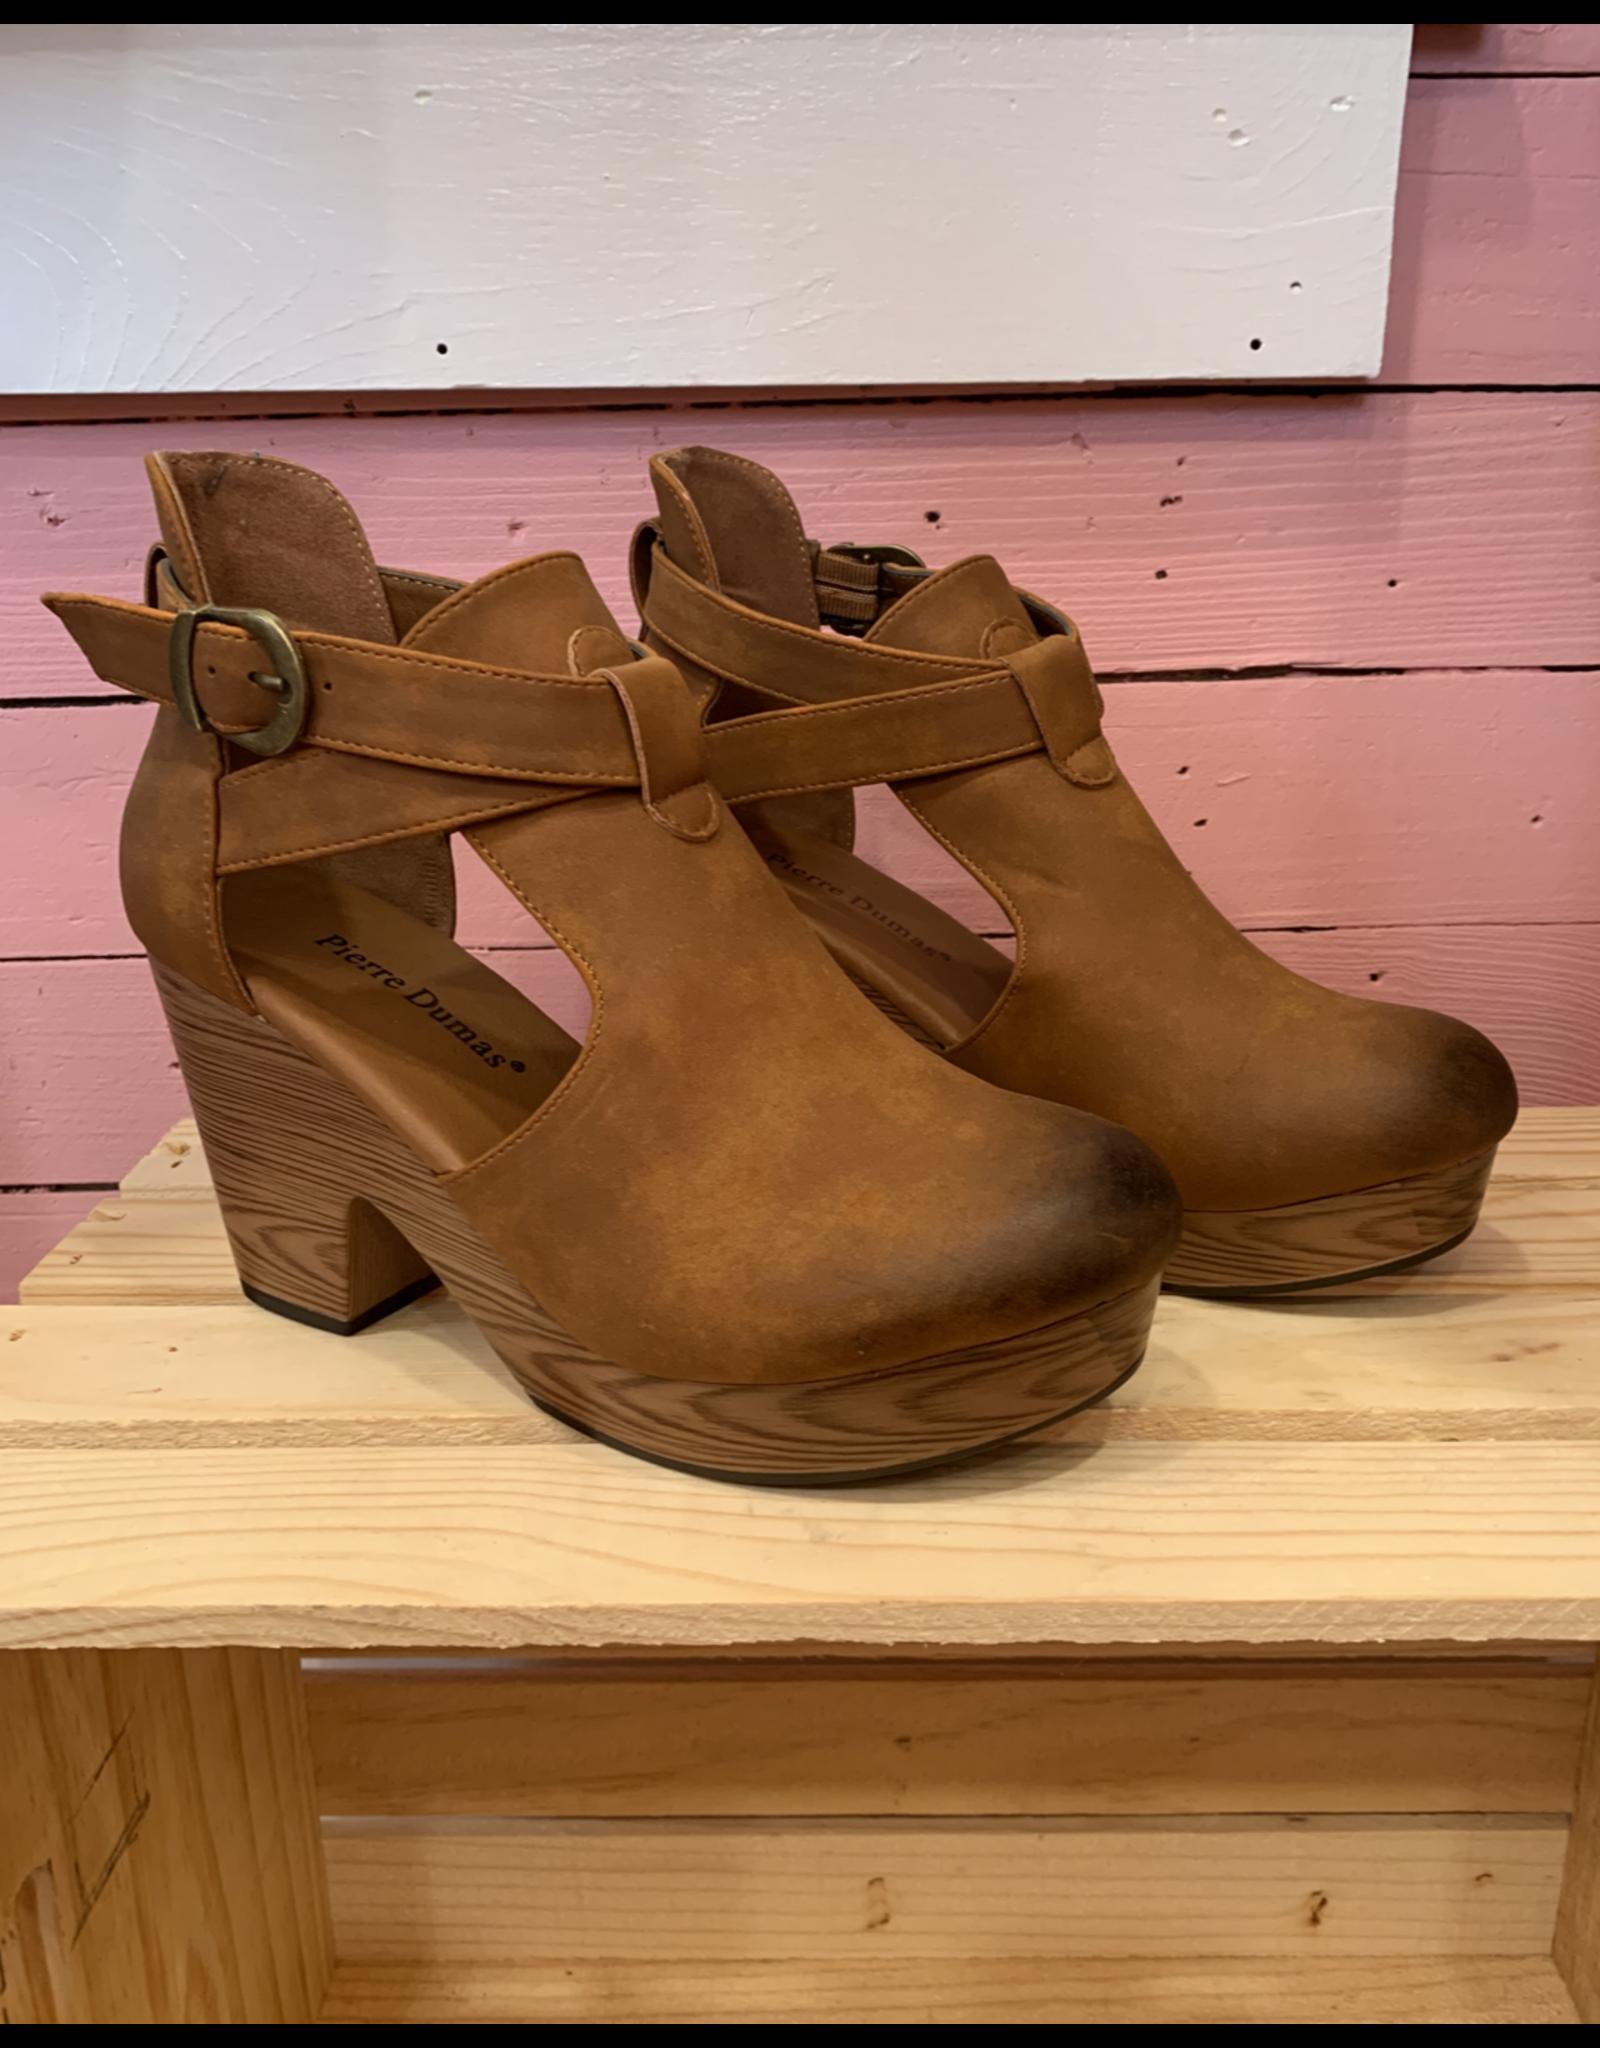 Miami Shoe Shoe- heeled sandal